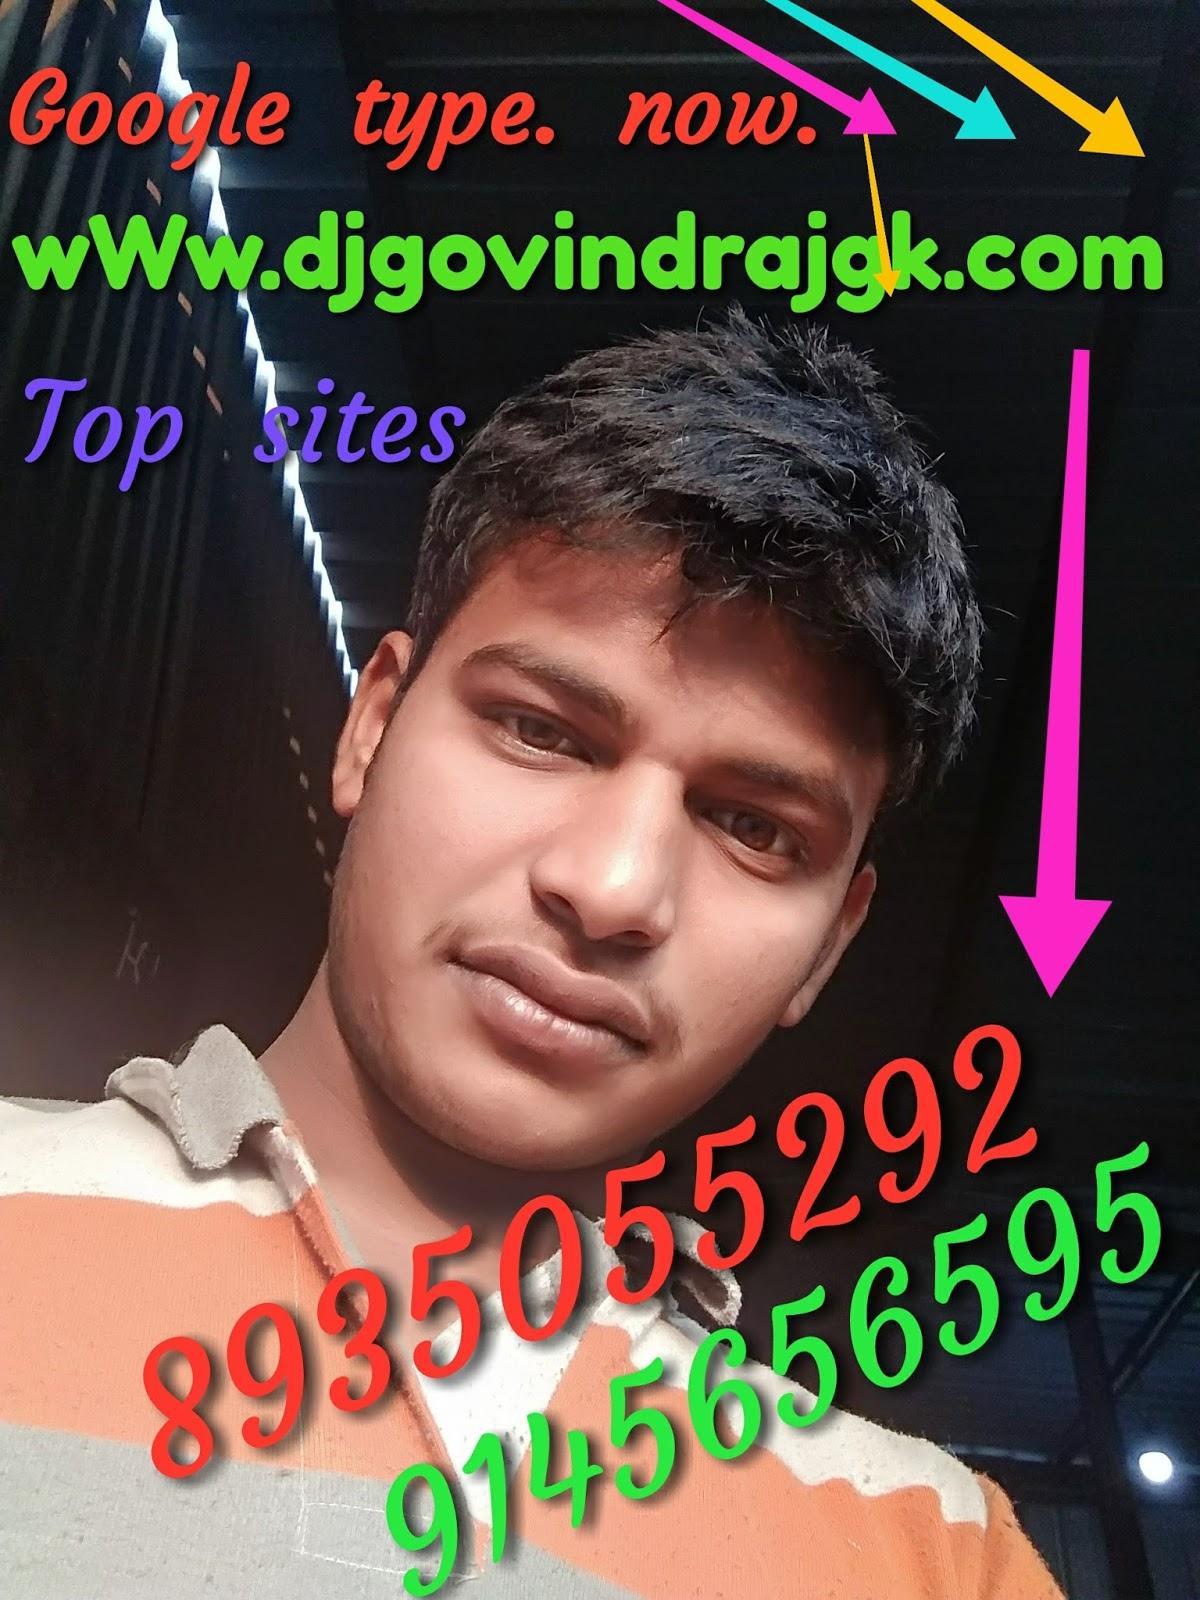 DJ Govinda Raj GK Bhojpuri and Hindi Bass remix all remixer